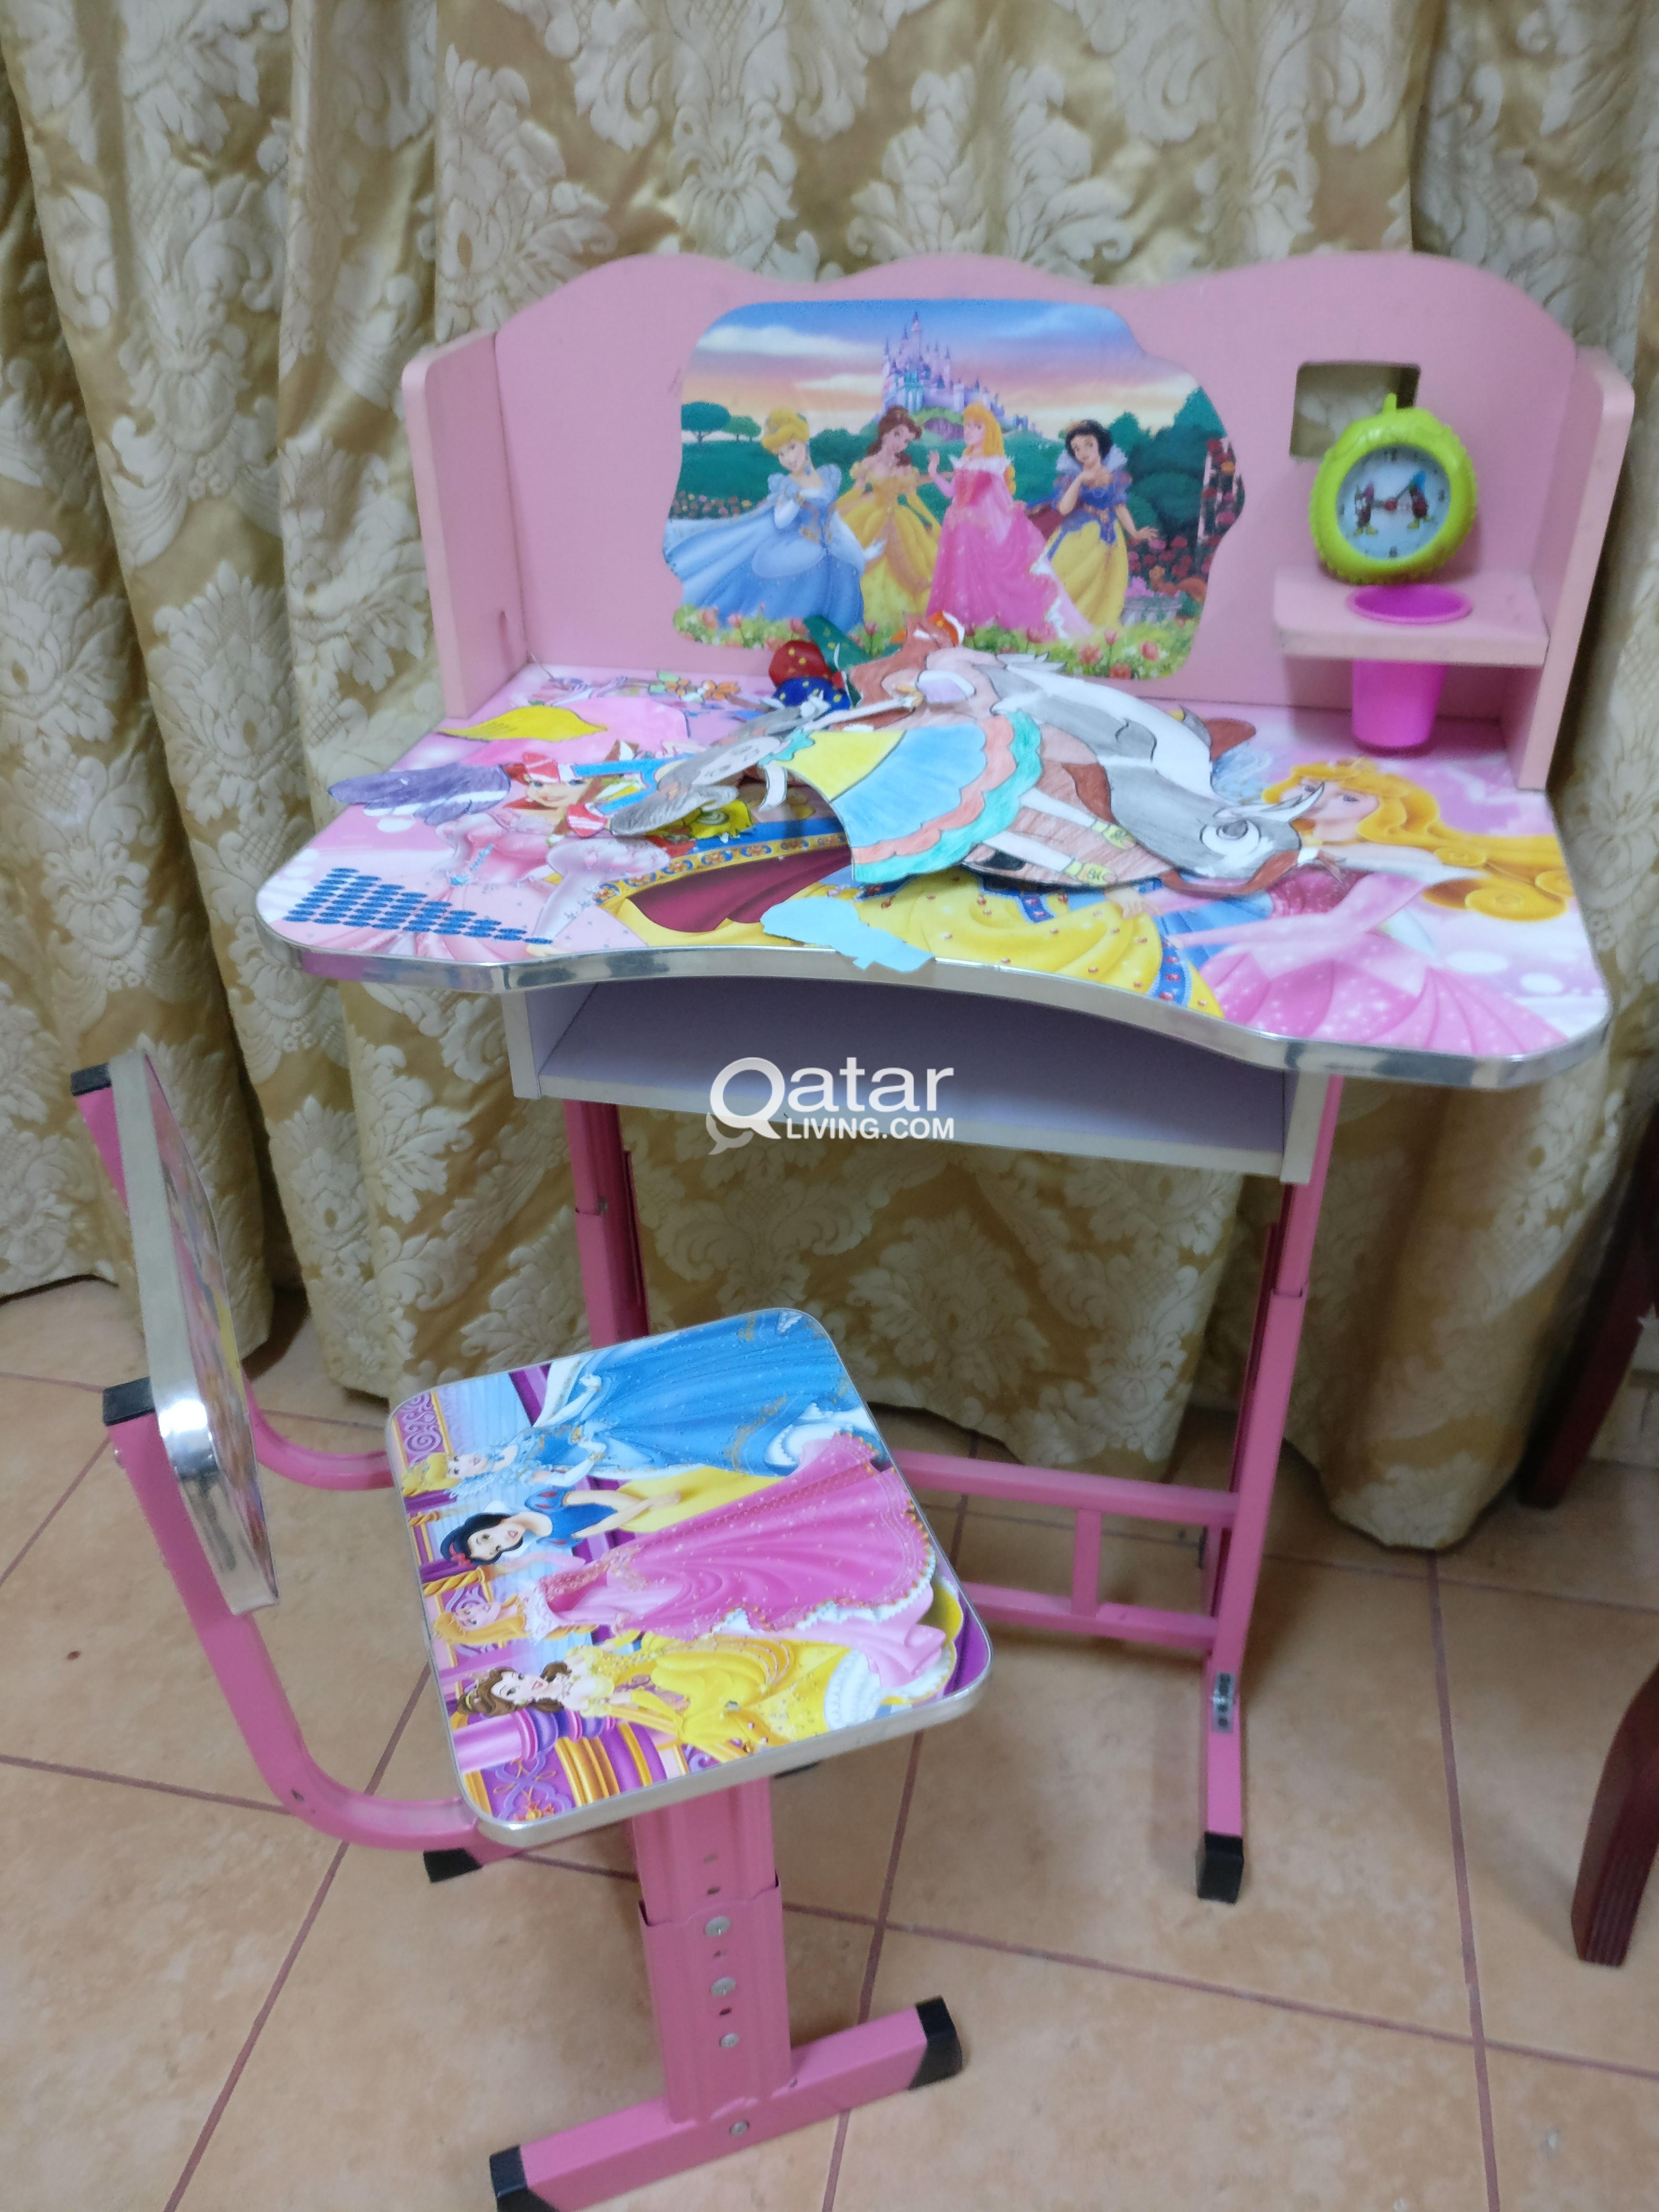 Barbie Girl Study Table | Qatar Living